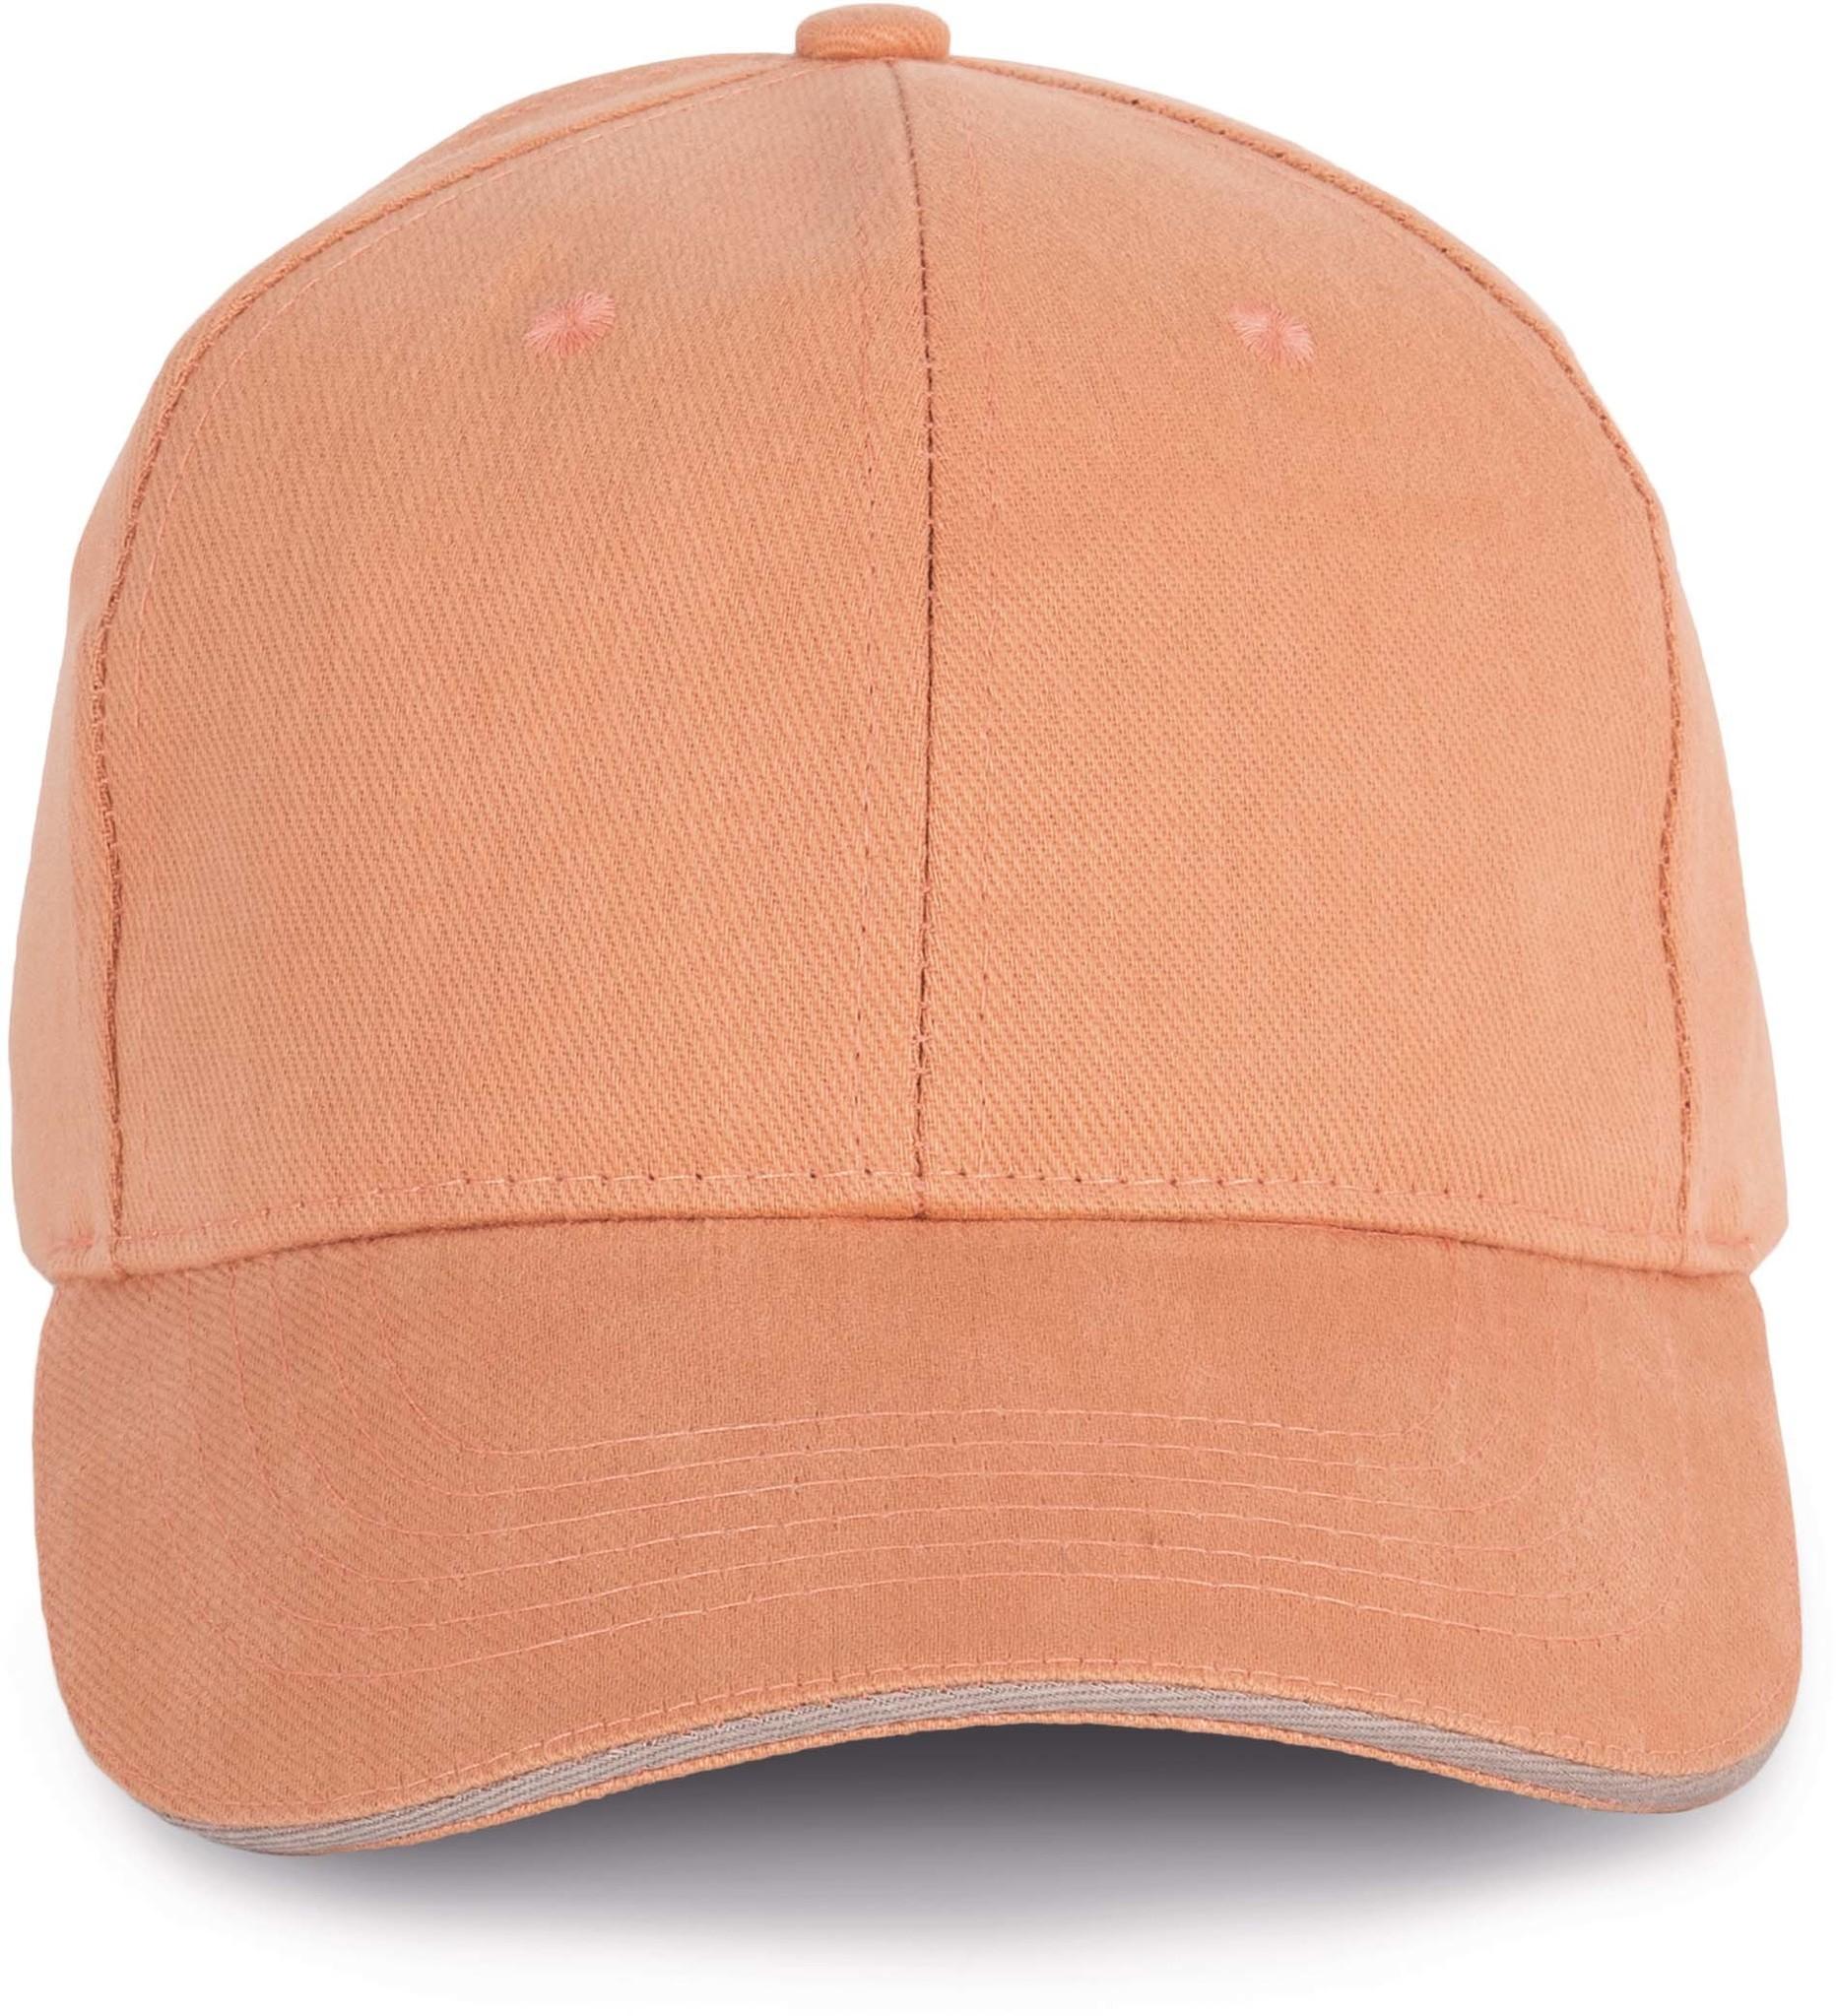 Cap van 100% Biokatoen kleur Peach-Metalgrey